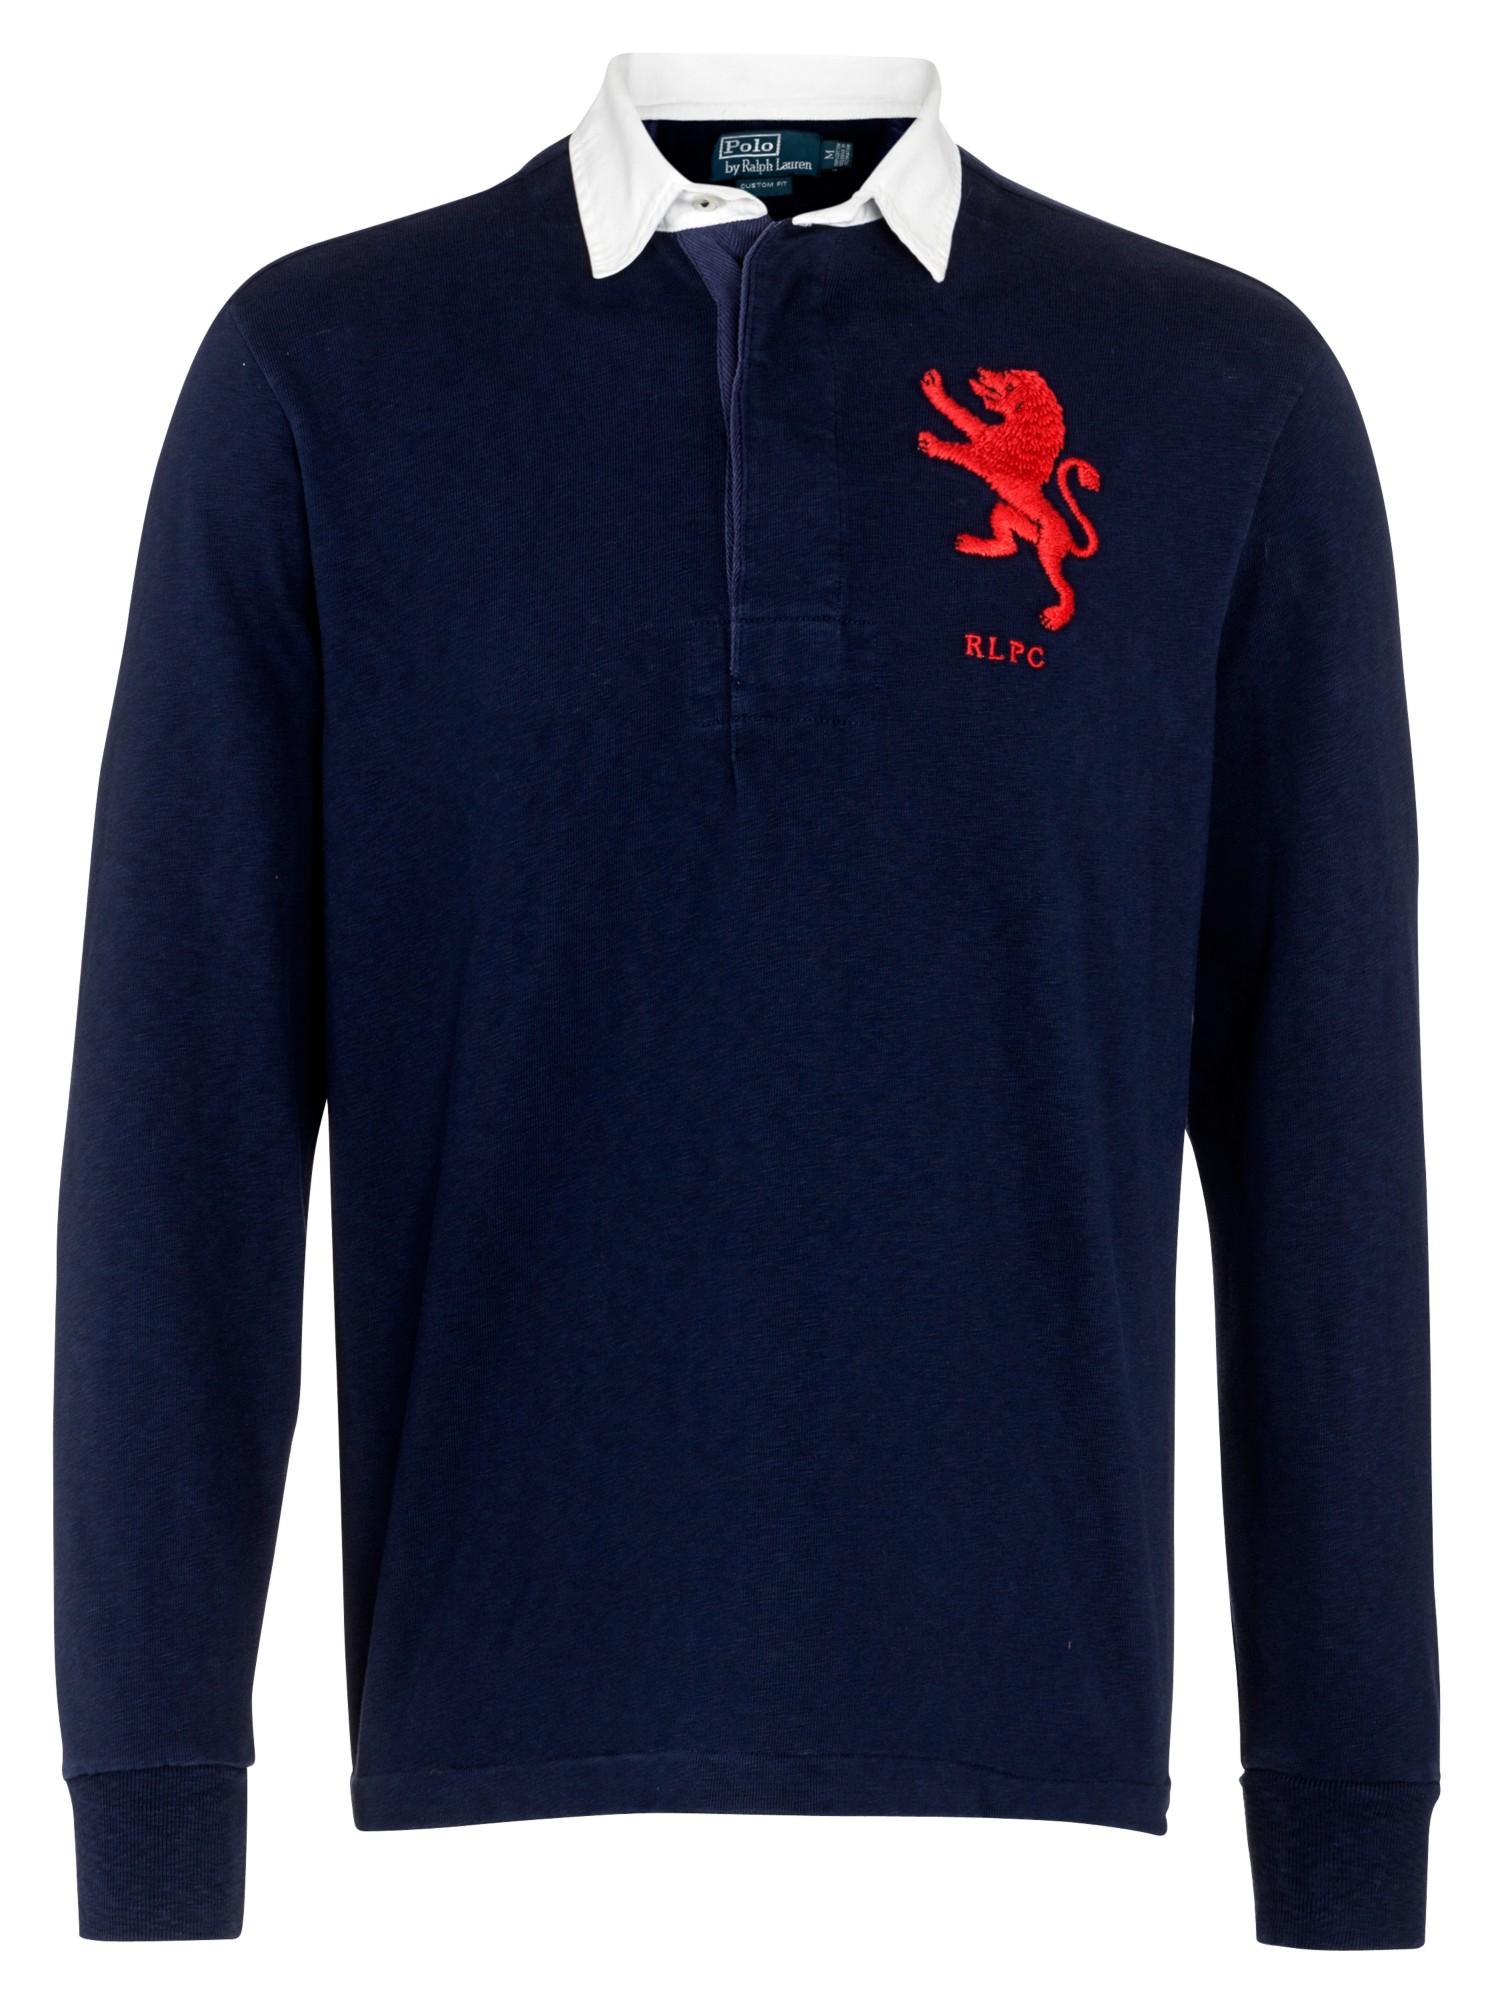 Polo ralph lauren blue lion rugby jersey top for men lyst for Ralph lauren polo jersey shirt